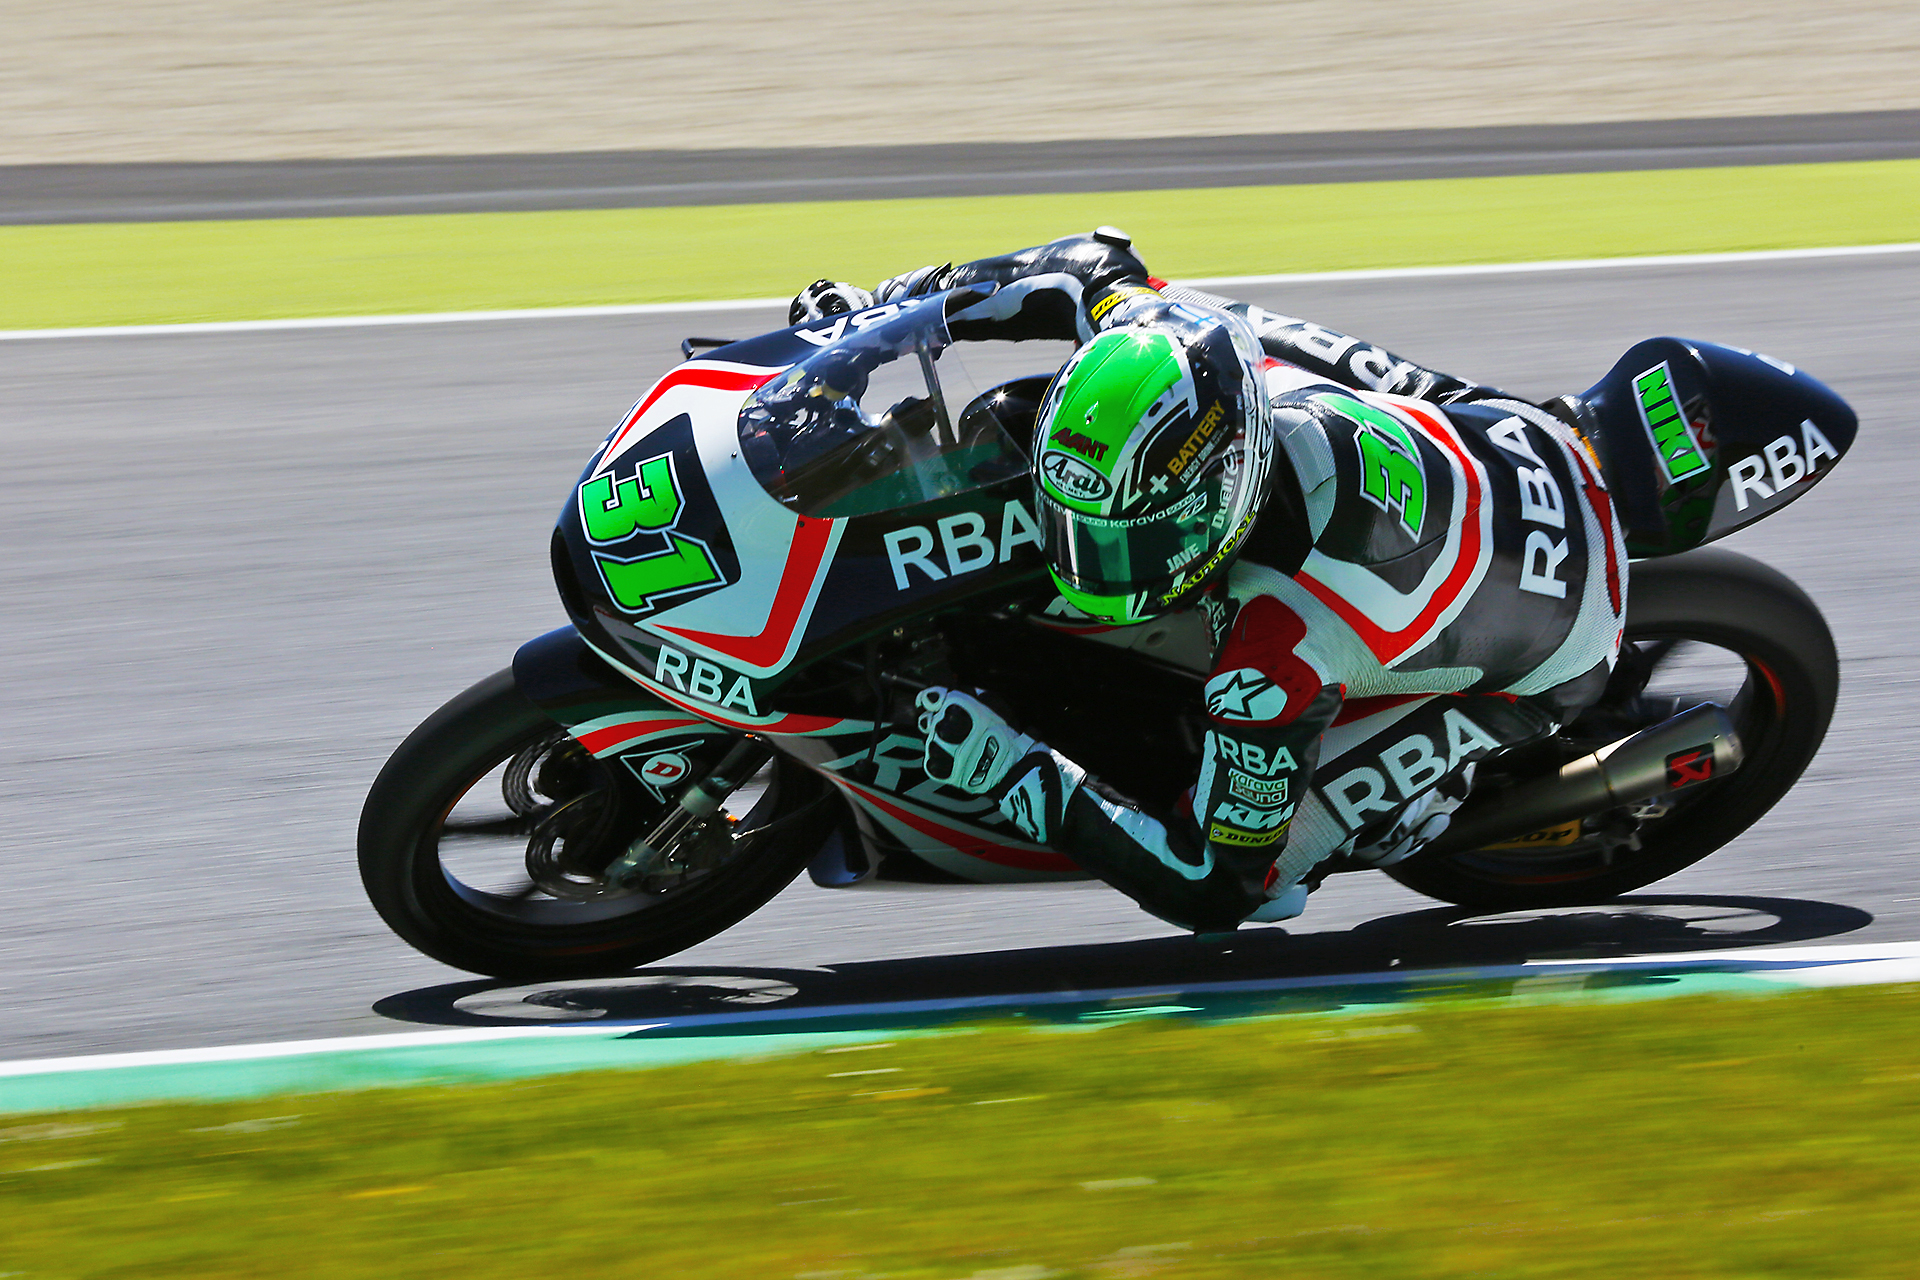 Niklas Ajo World Championship Moto3